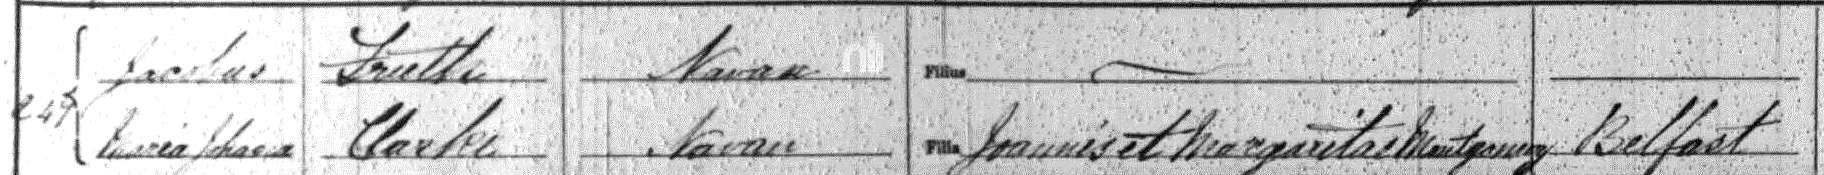 Entry from marriage register for Jacobus Freeth and Maria Johana Clarke, 5 February 1877, Roman Catholic Chapel of Navan